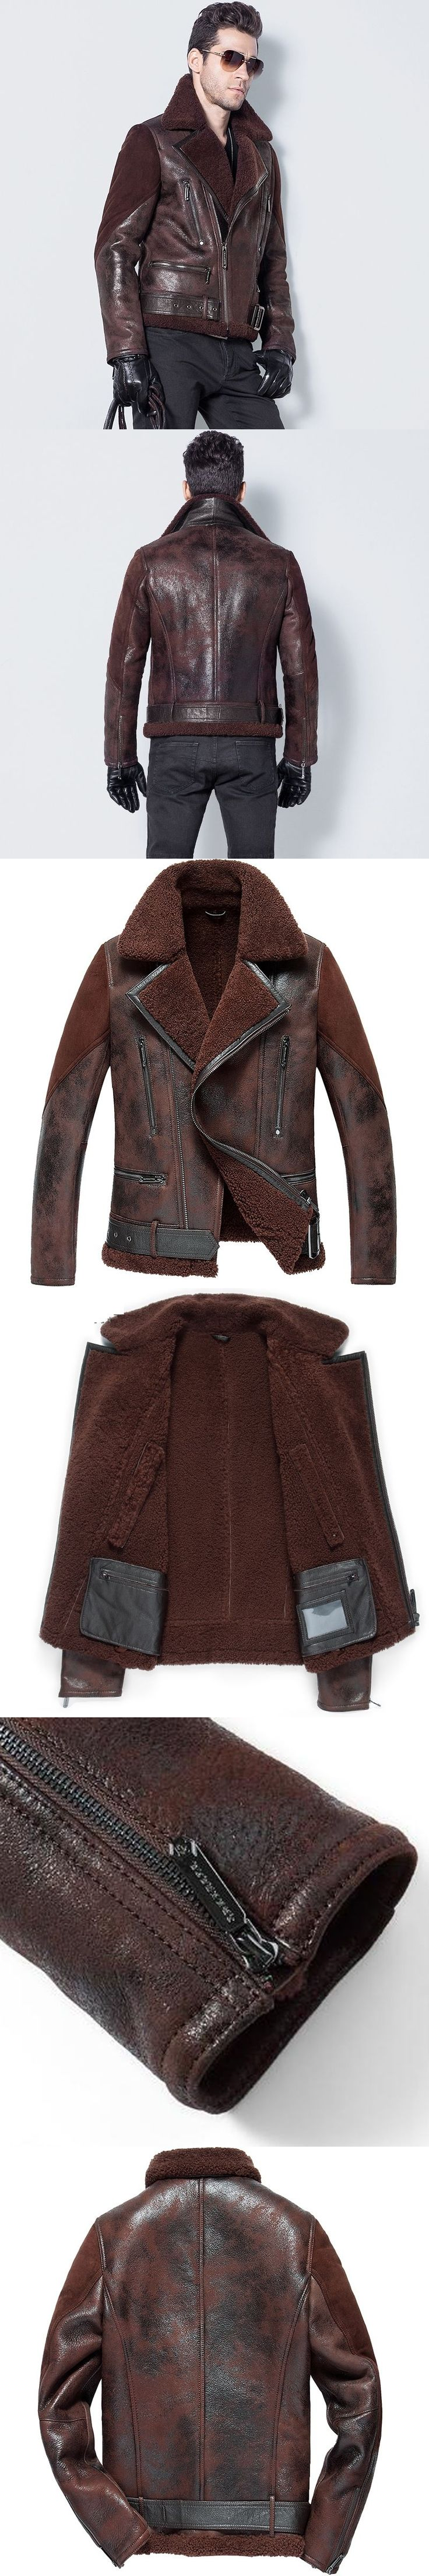 Men's Lamb Fur Jacket Double-Face Fur Coat Sheep Fur Leather Jacket Fashion Slim Short Casual Jacket Turn-down Collar   GSJ118